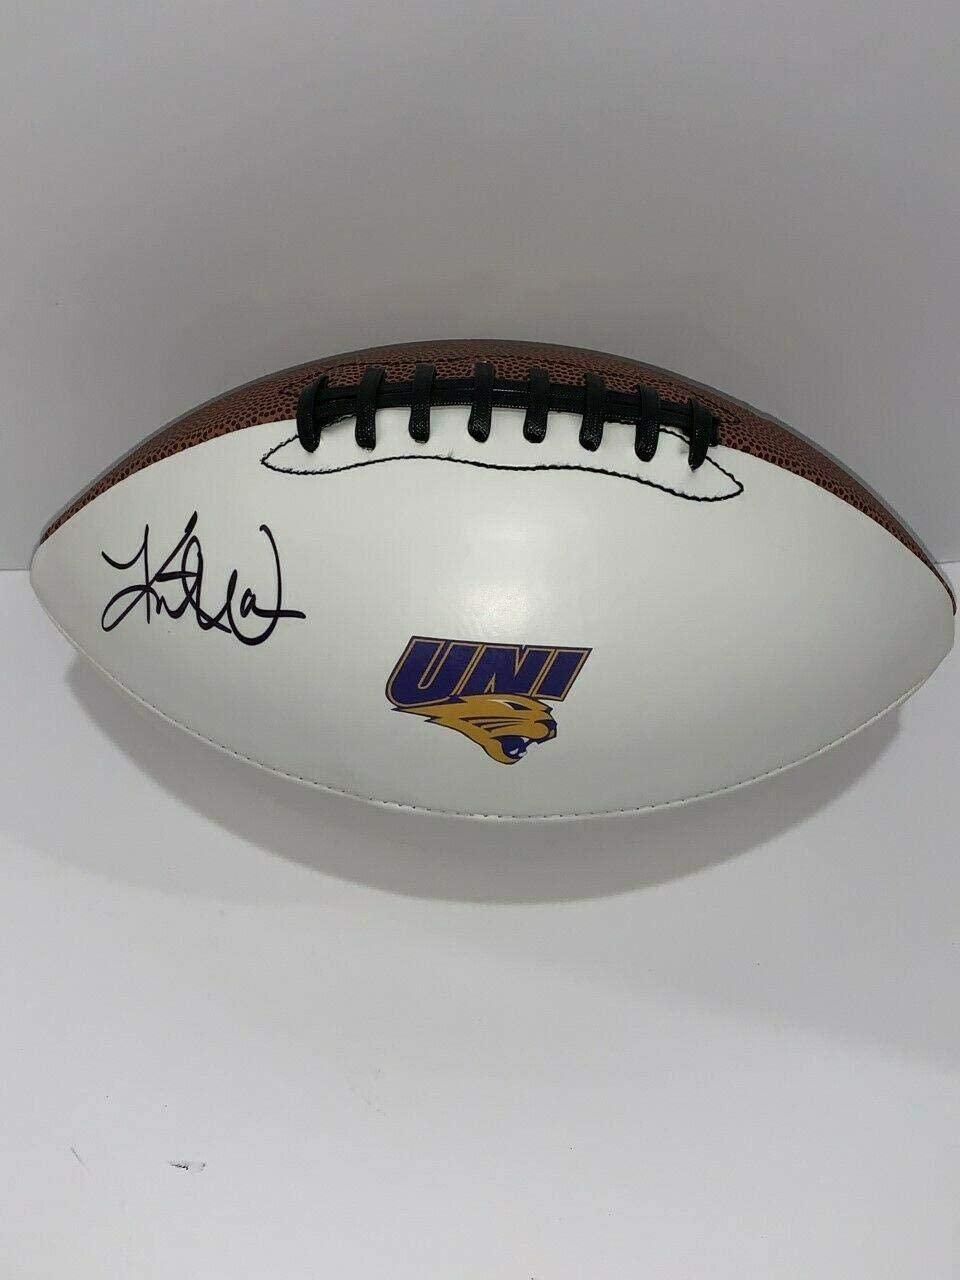 Kurt Warner Signed Football Northern Iowa Panthers Uni Proof Hof - Autographed College Footballs